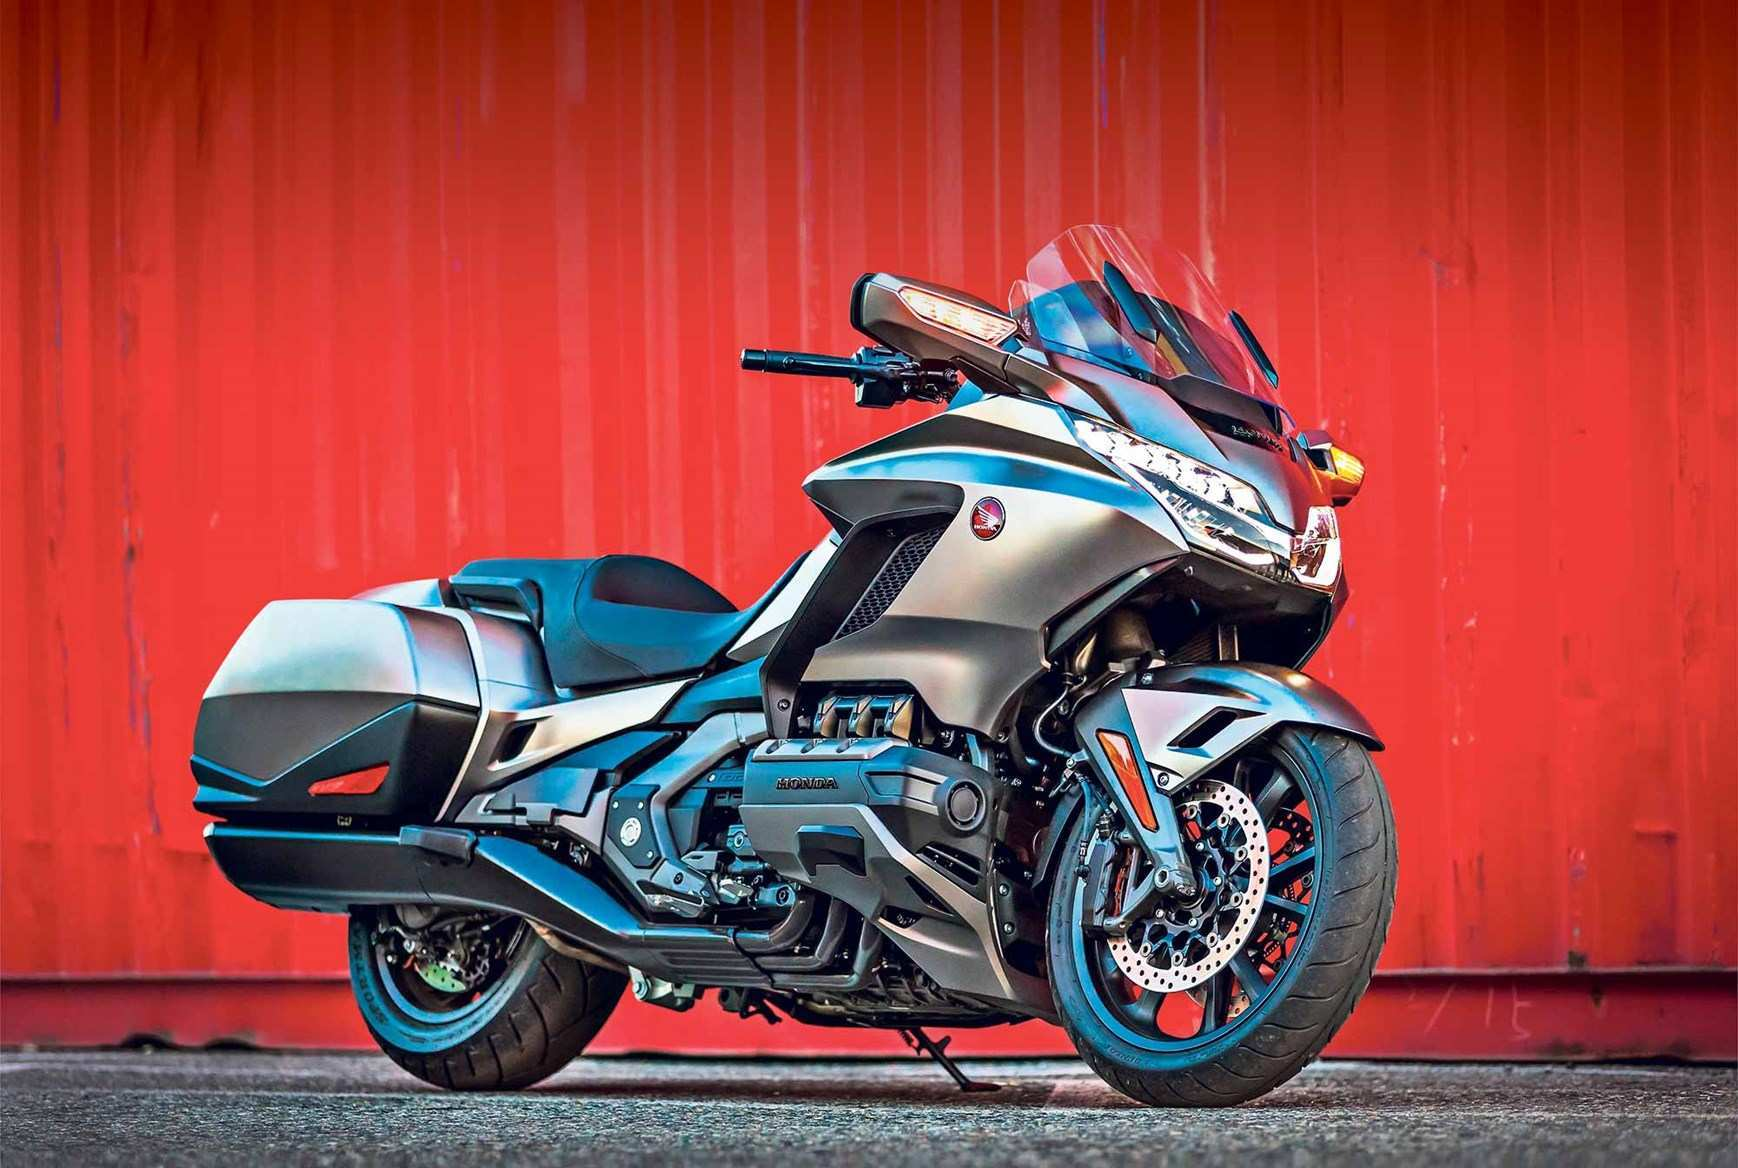 33 The Honda Goldwing 2020 Speed Test with Honda Goldwing 2020